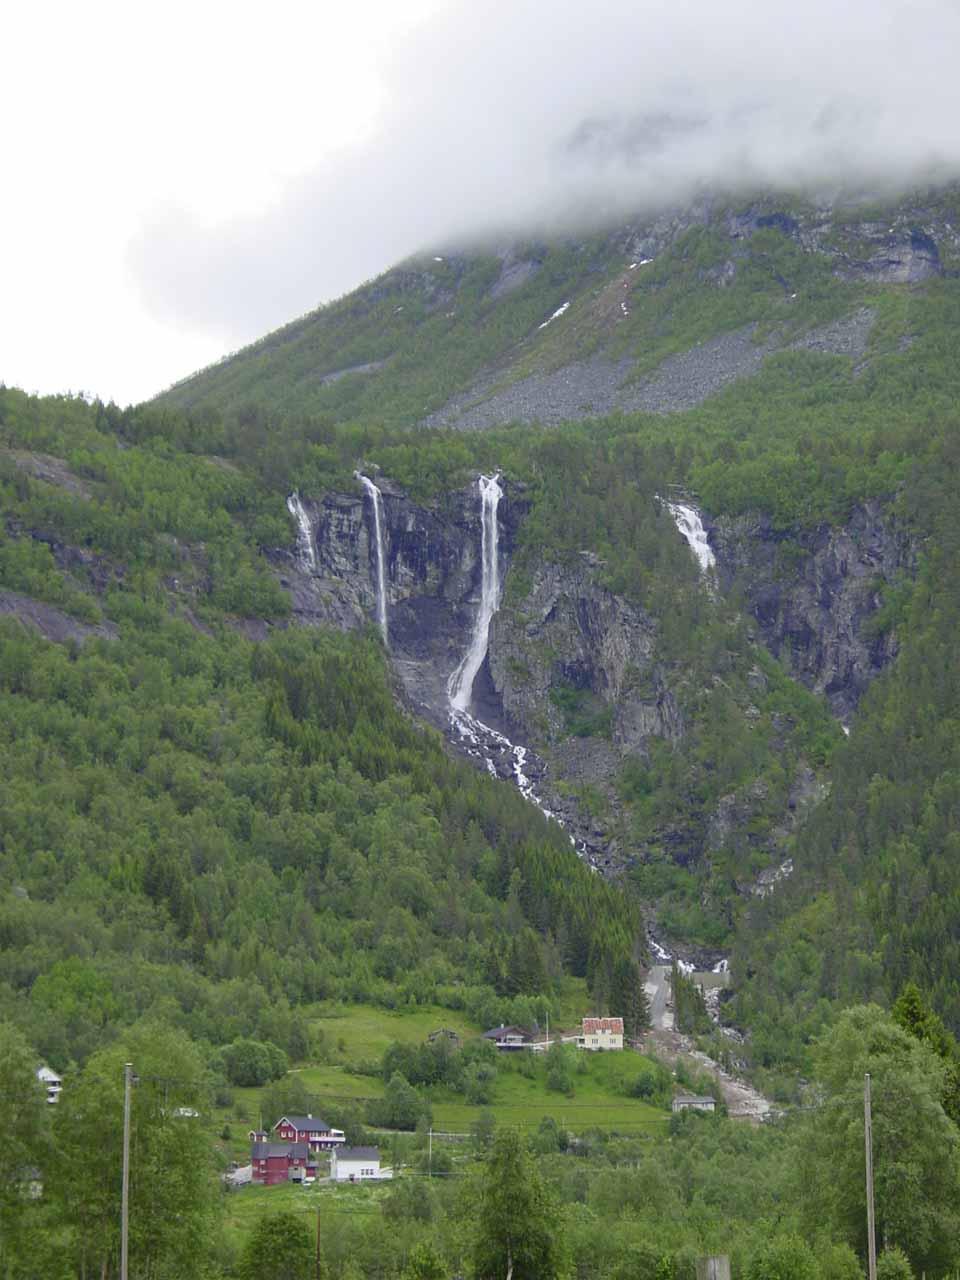 Geisfossen in the Jostedal Valley